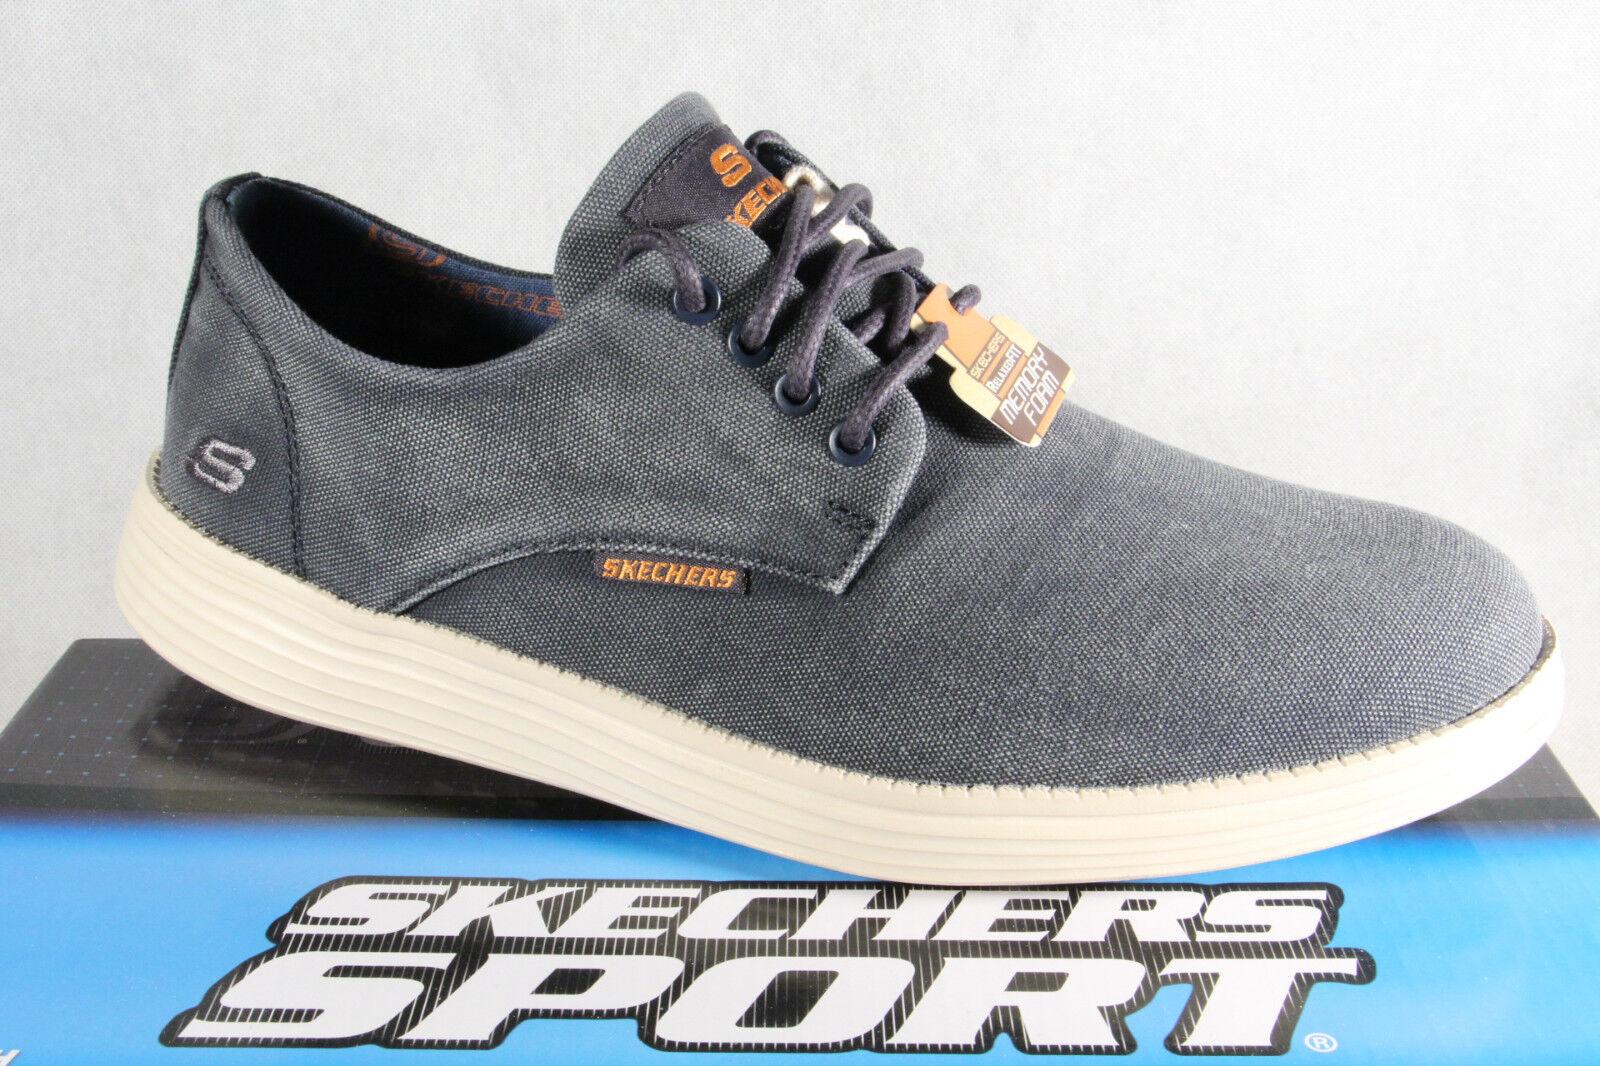 5e97fa8569 Skechers Herren Schnürschuhe Sneakers Sportschuhe blau Vintage Washed NEU!